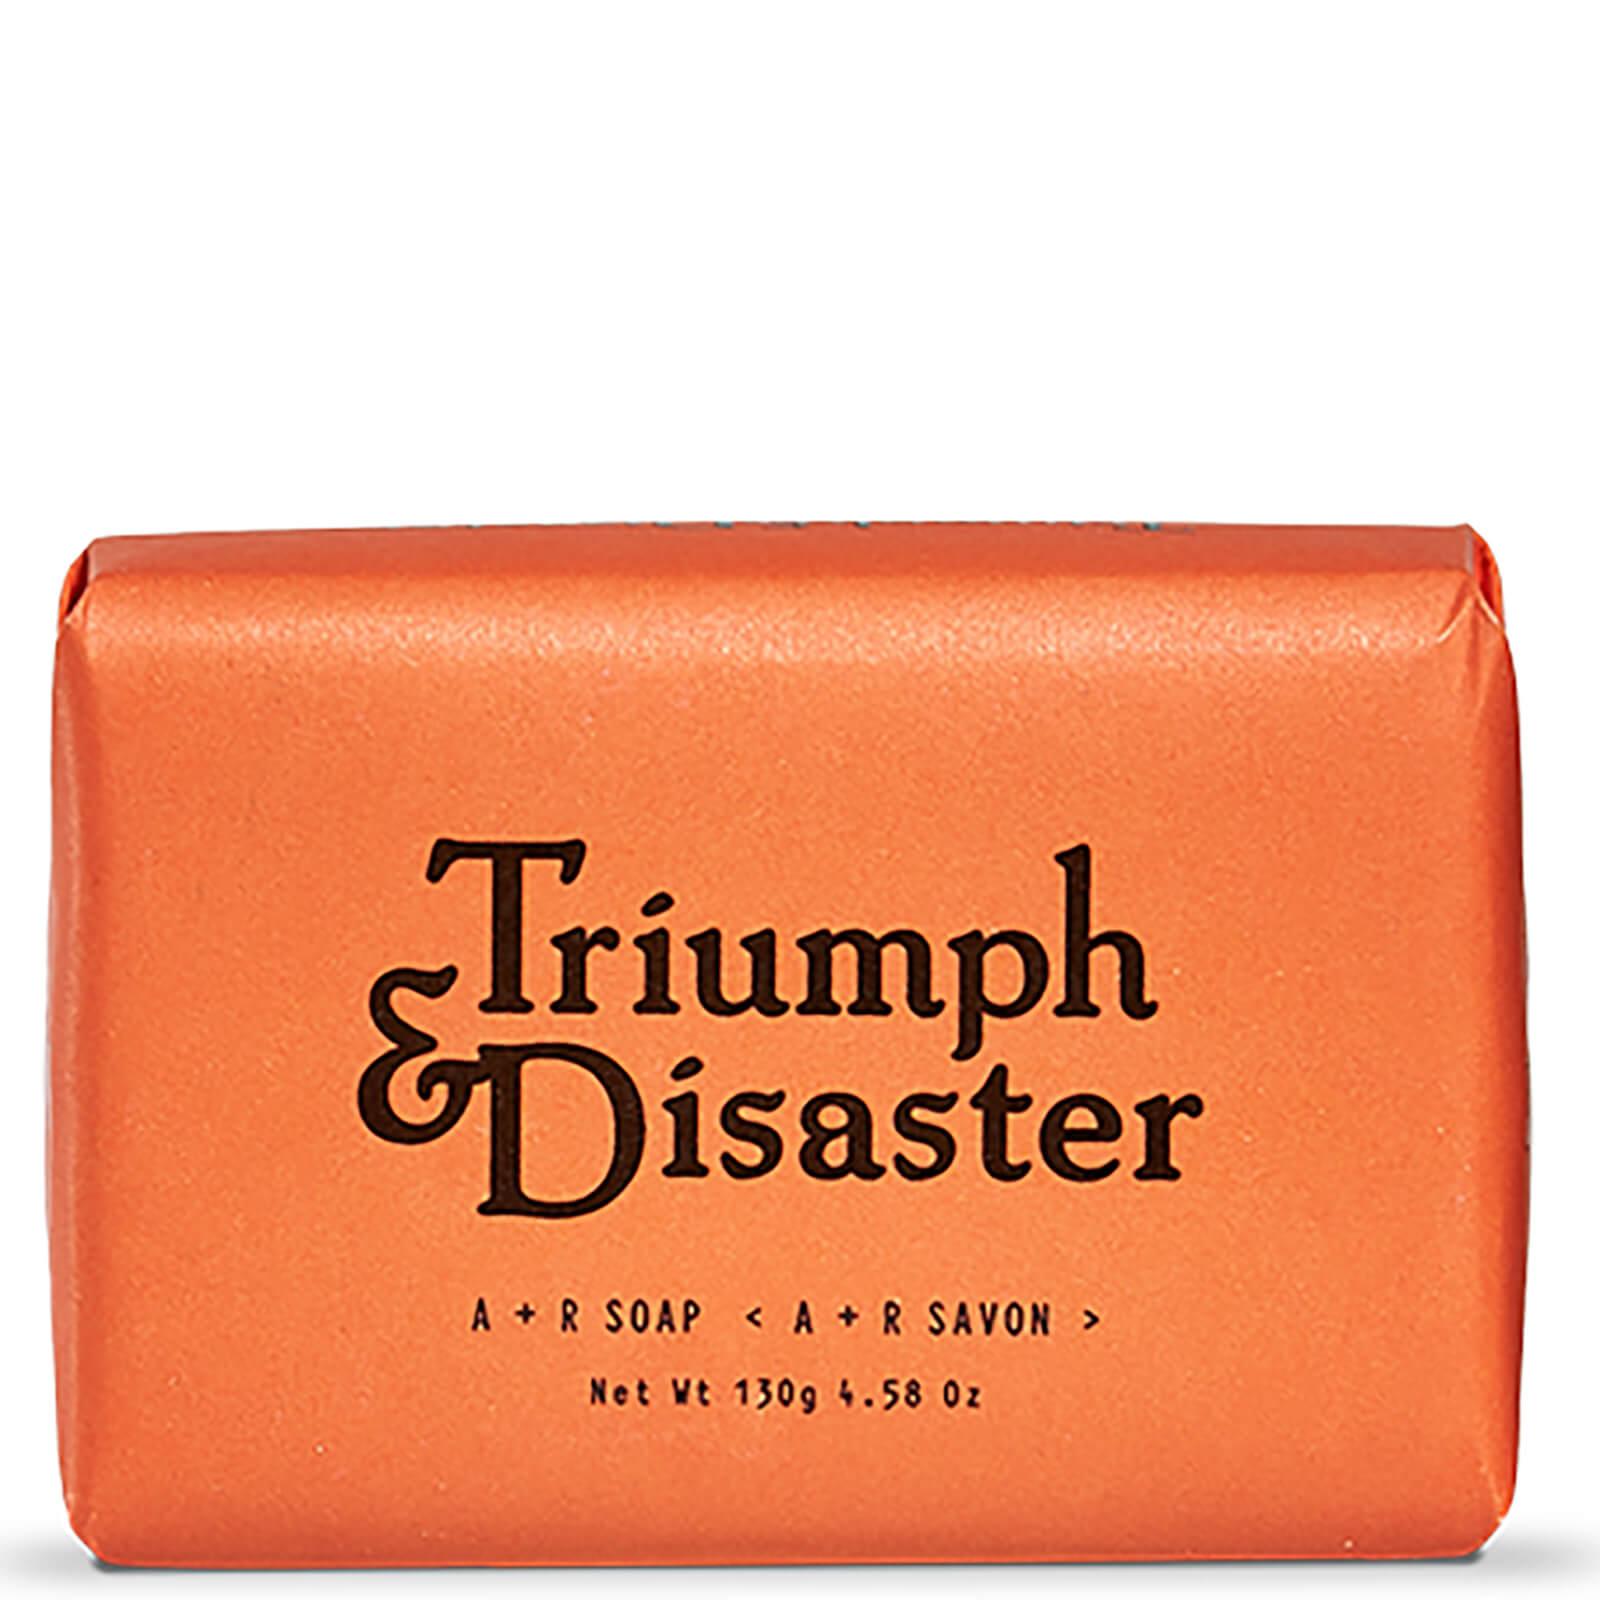 Triumph & Disaster A+R Soapde Triumph & Disaster 130g